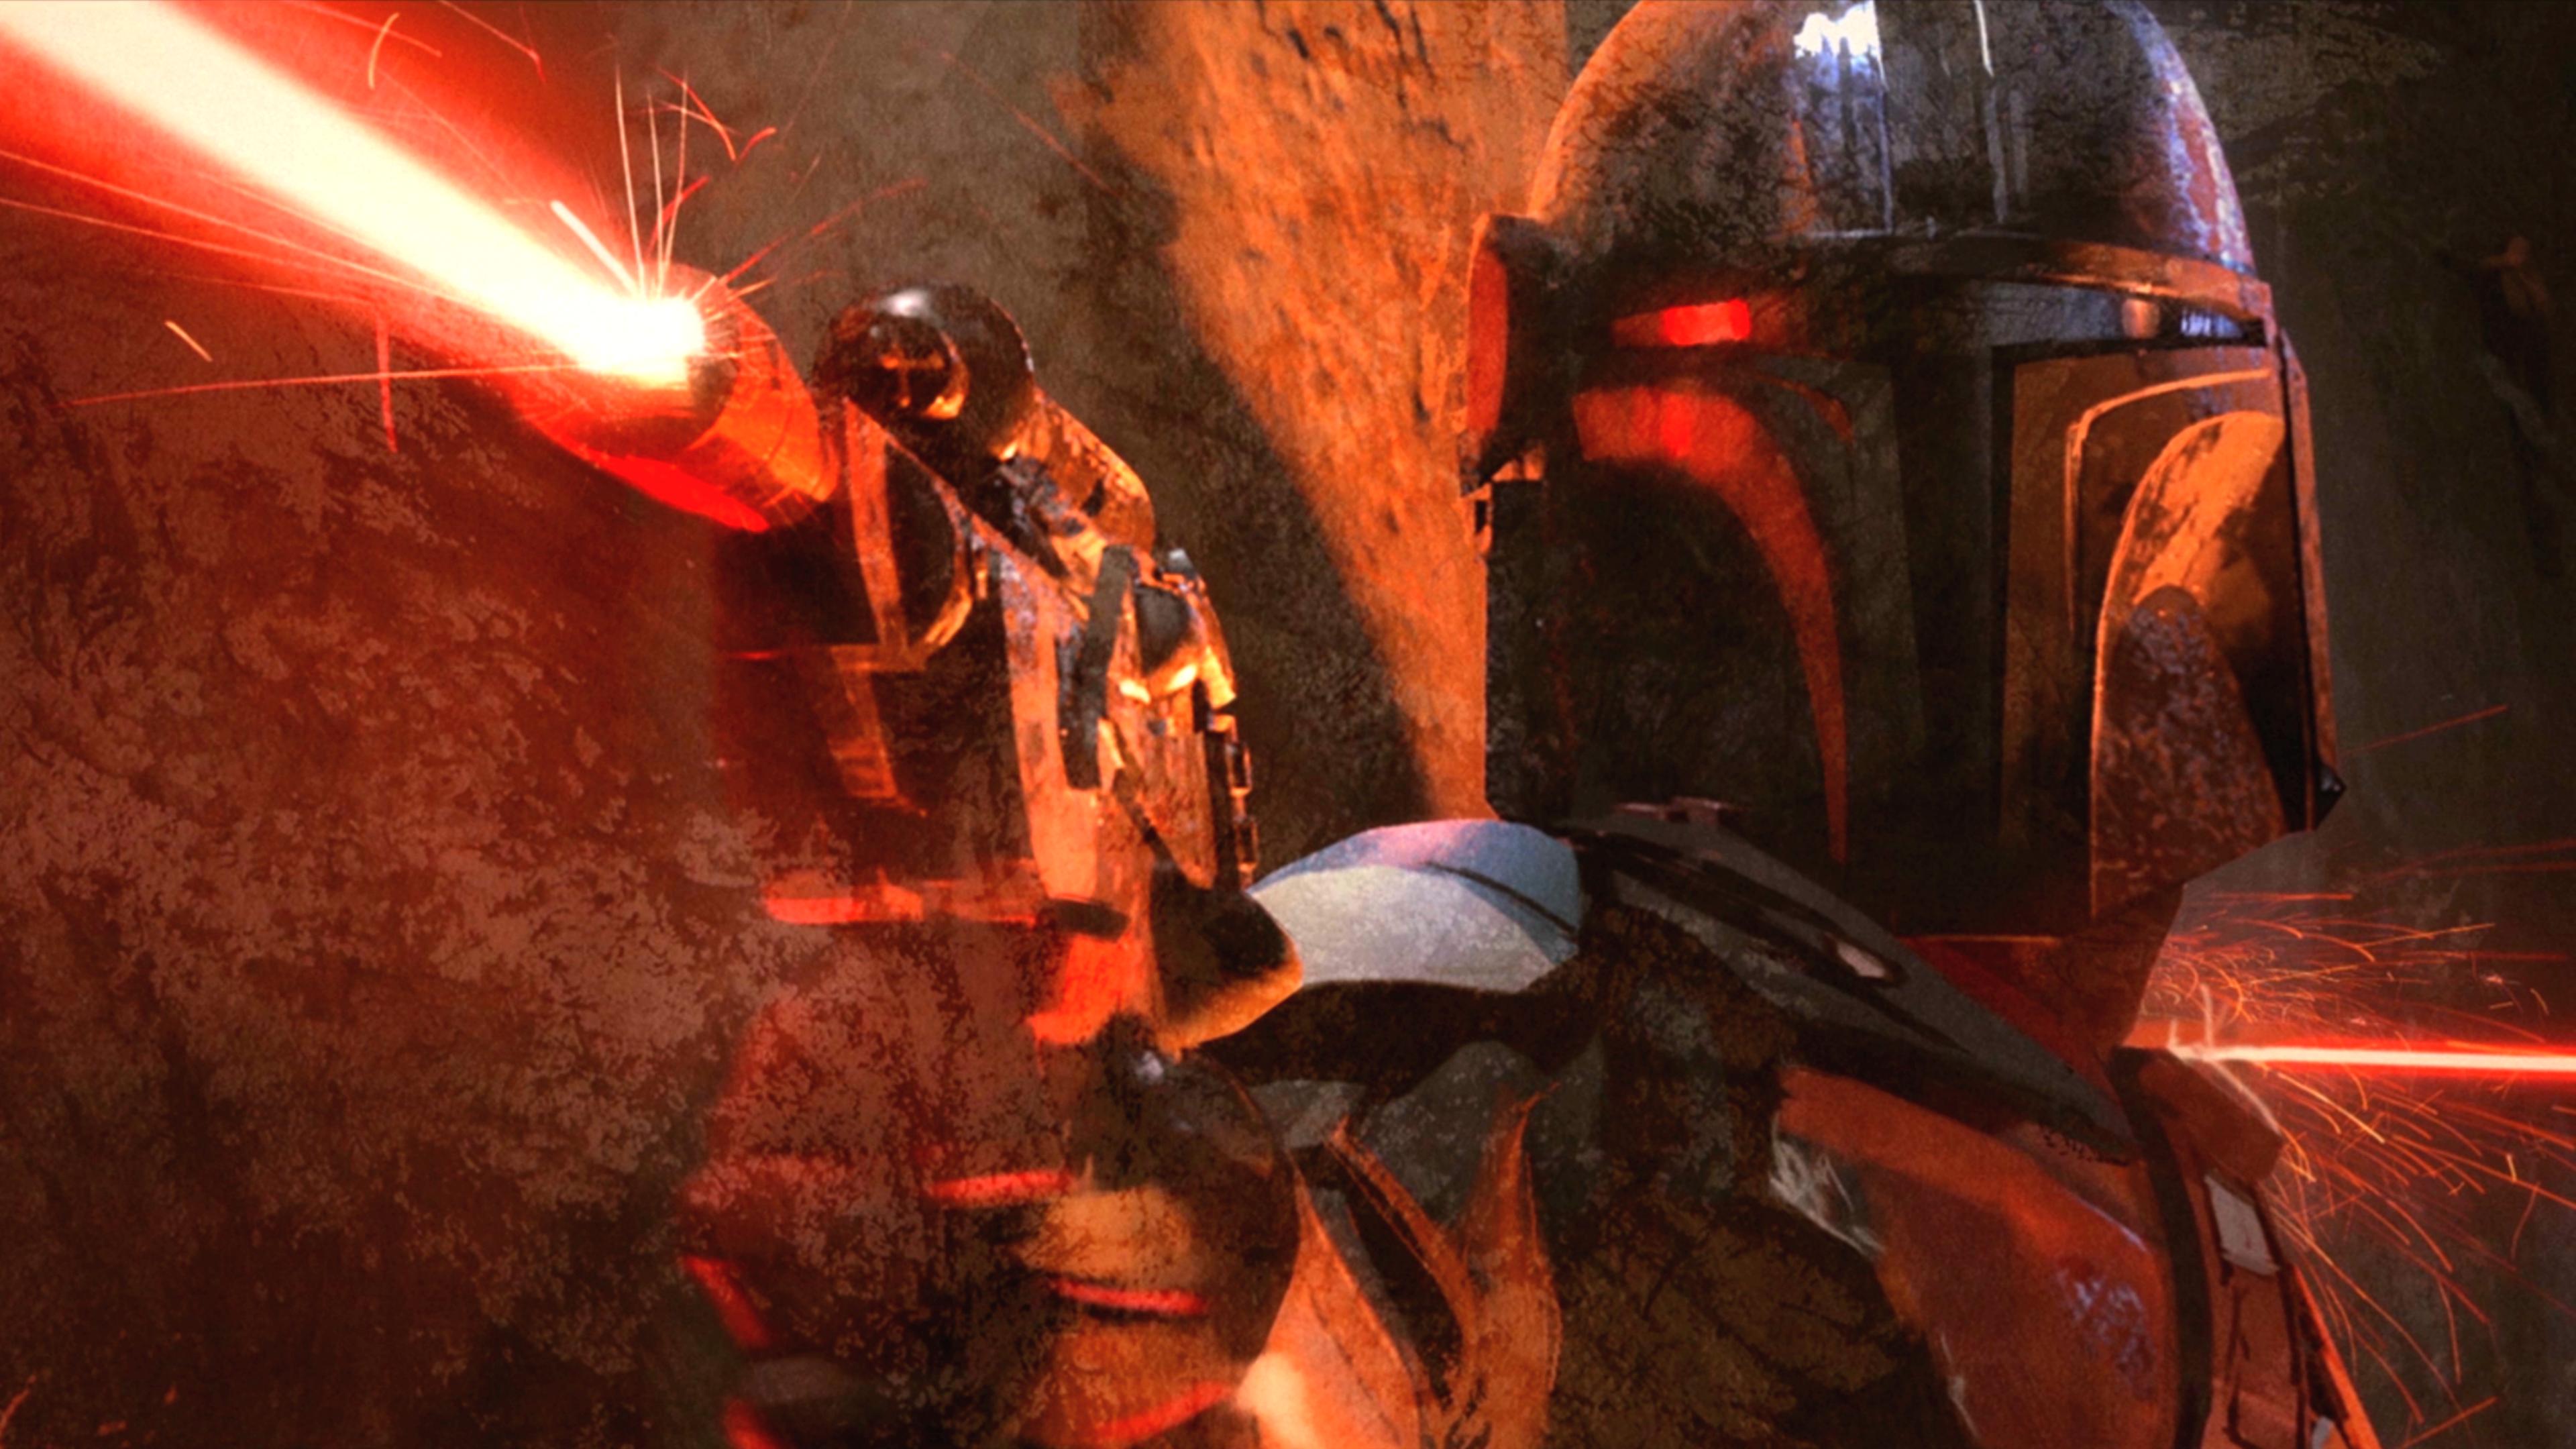 The Mandalorian end credits artwork super enhanced 4K [3840x2160 3840x2160